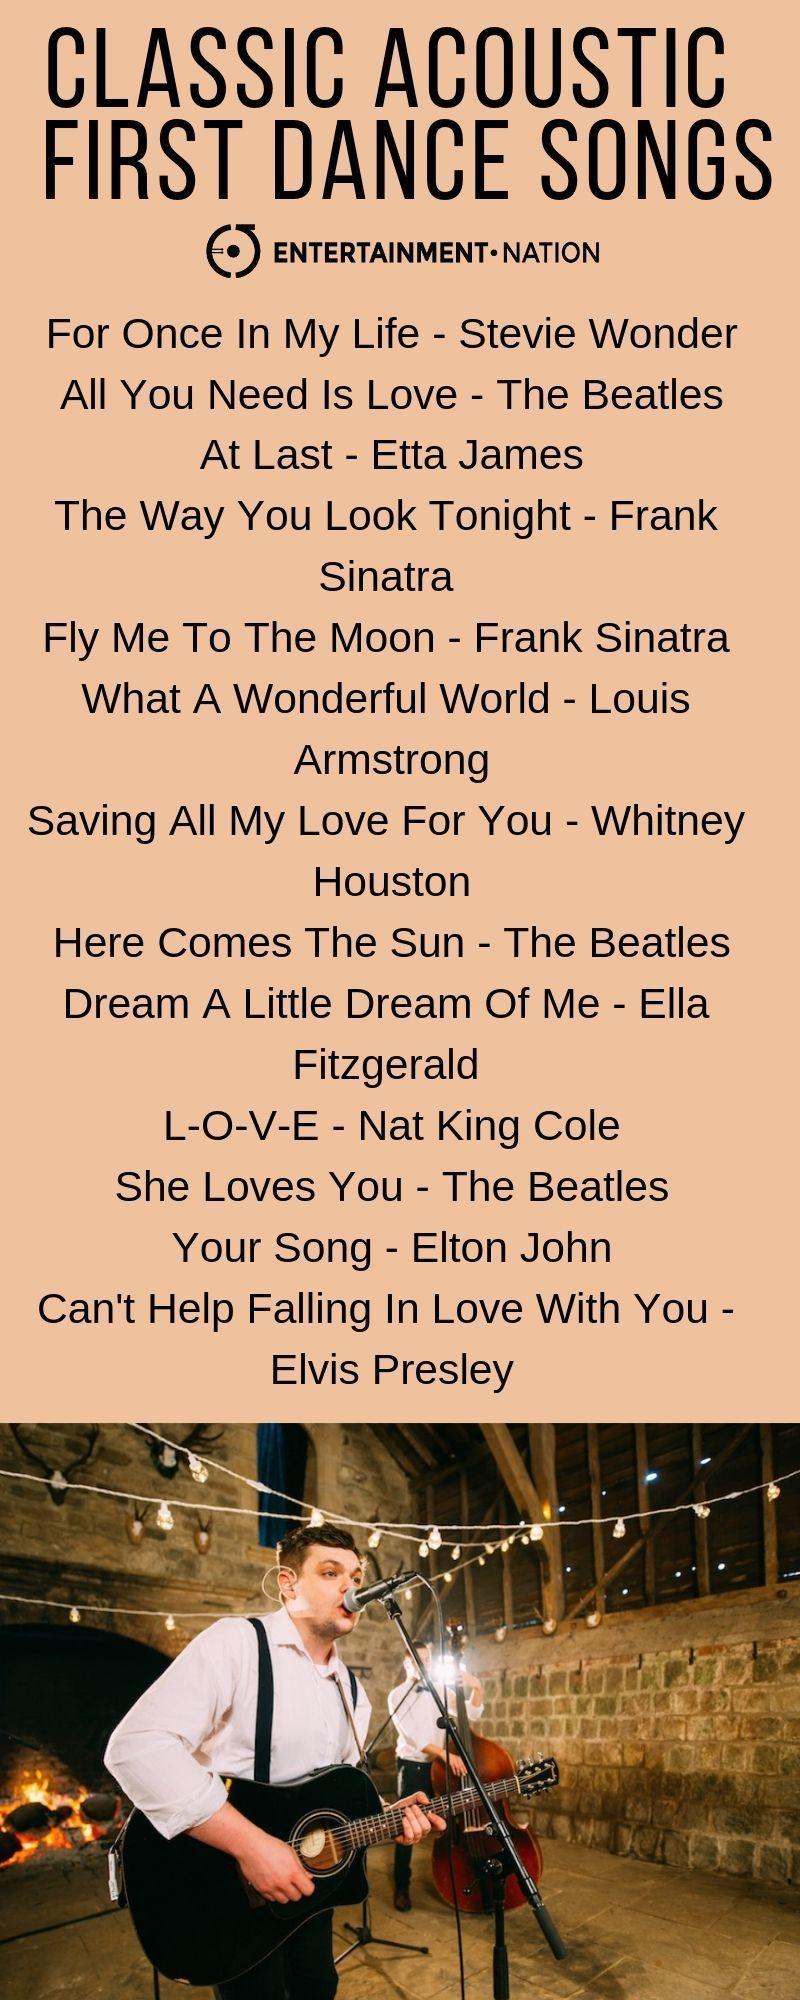 firstdancesongs in 2020 First dance wedding songs